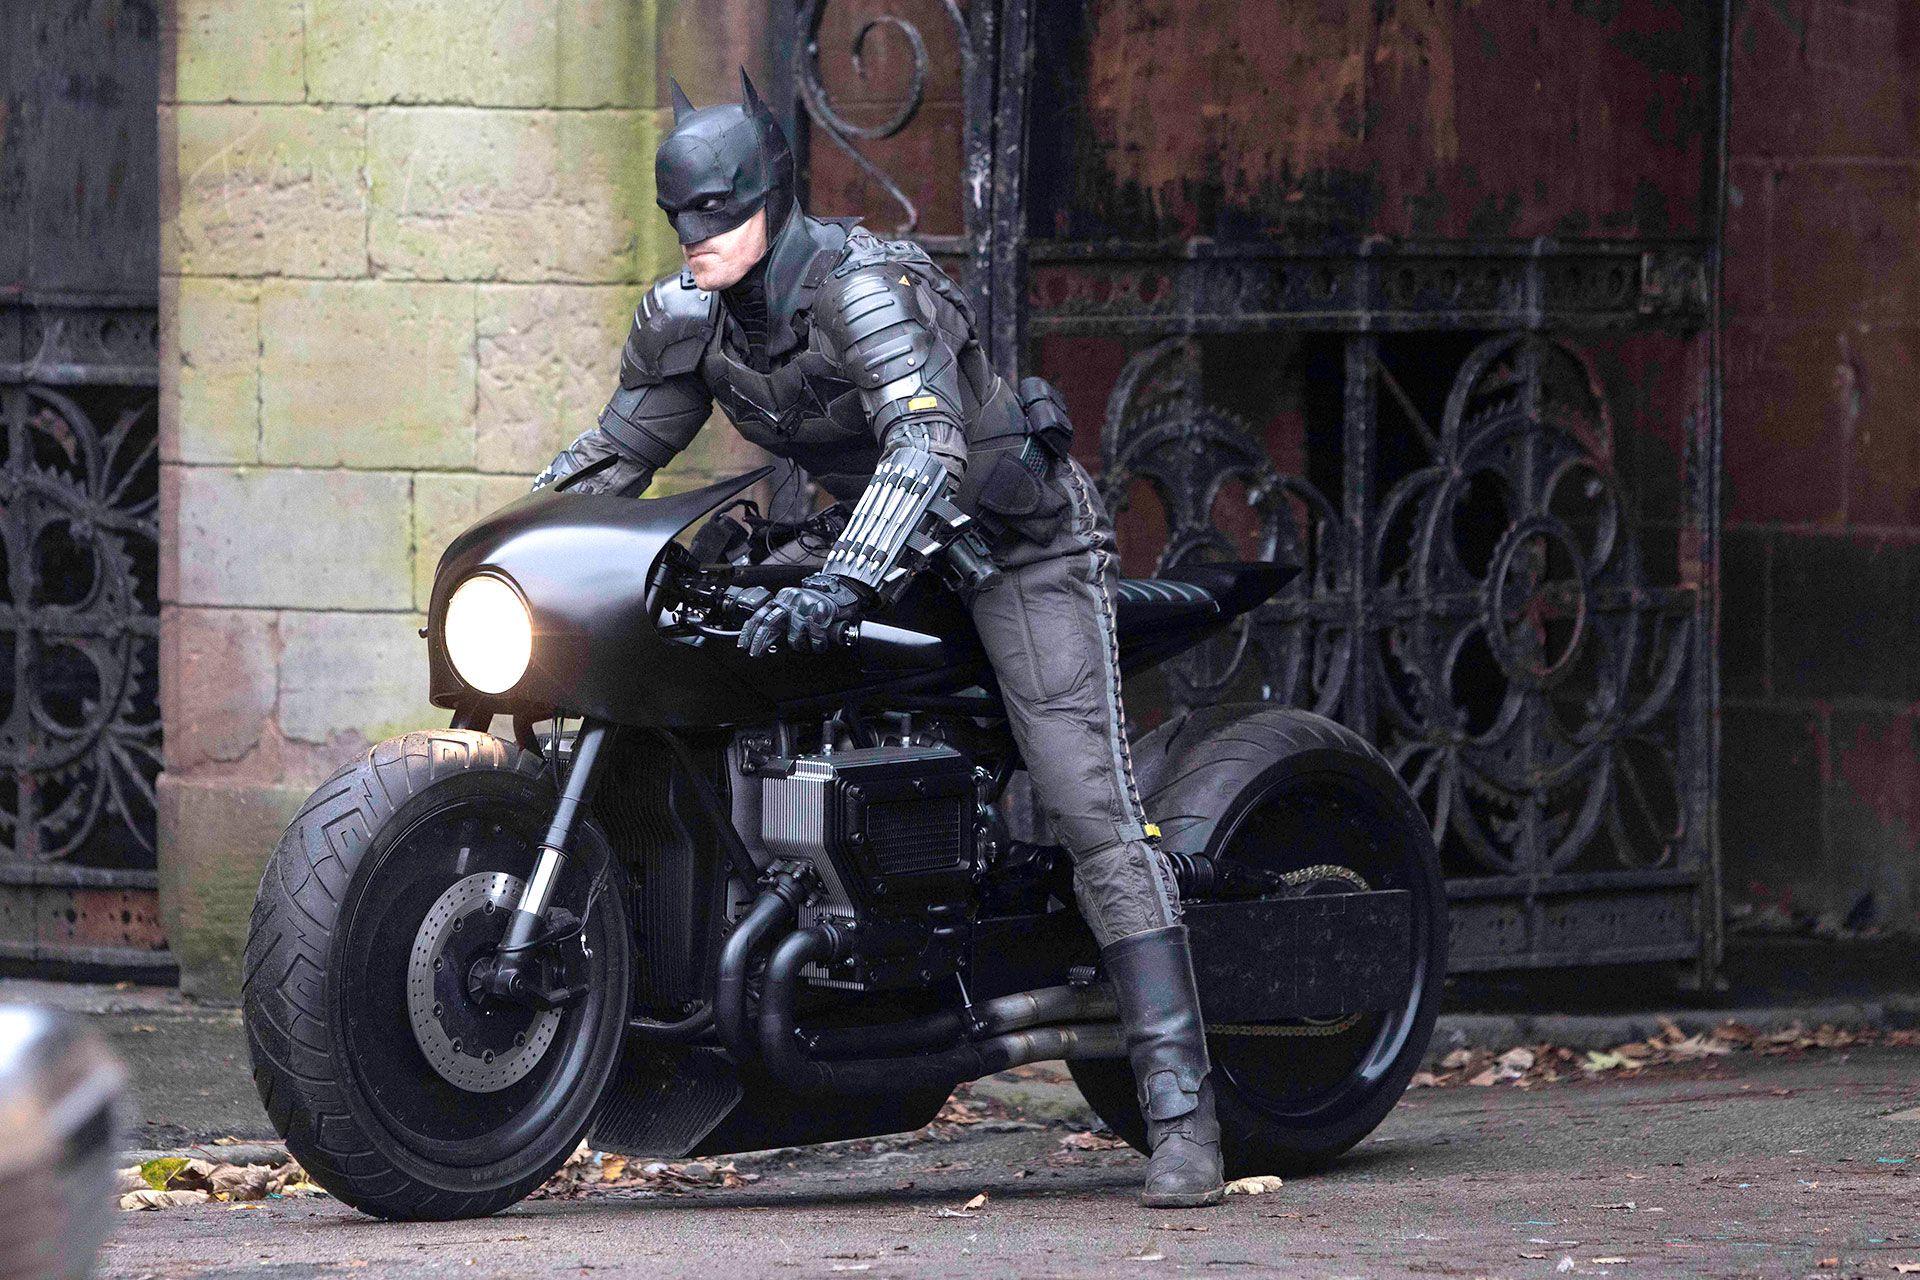 Celebrities-en-un-clic-Robert-Pattinson-como-Batman-14102020